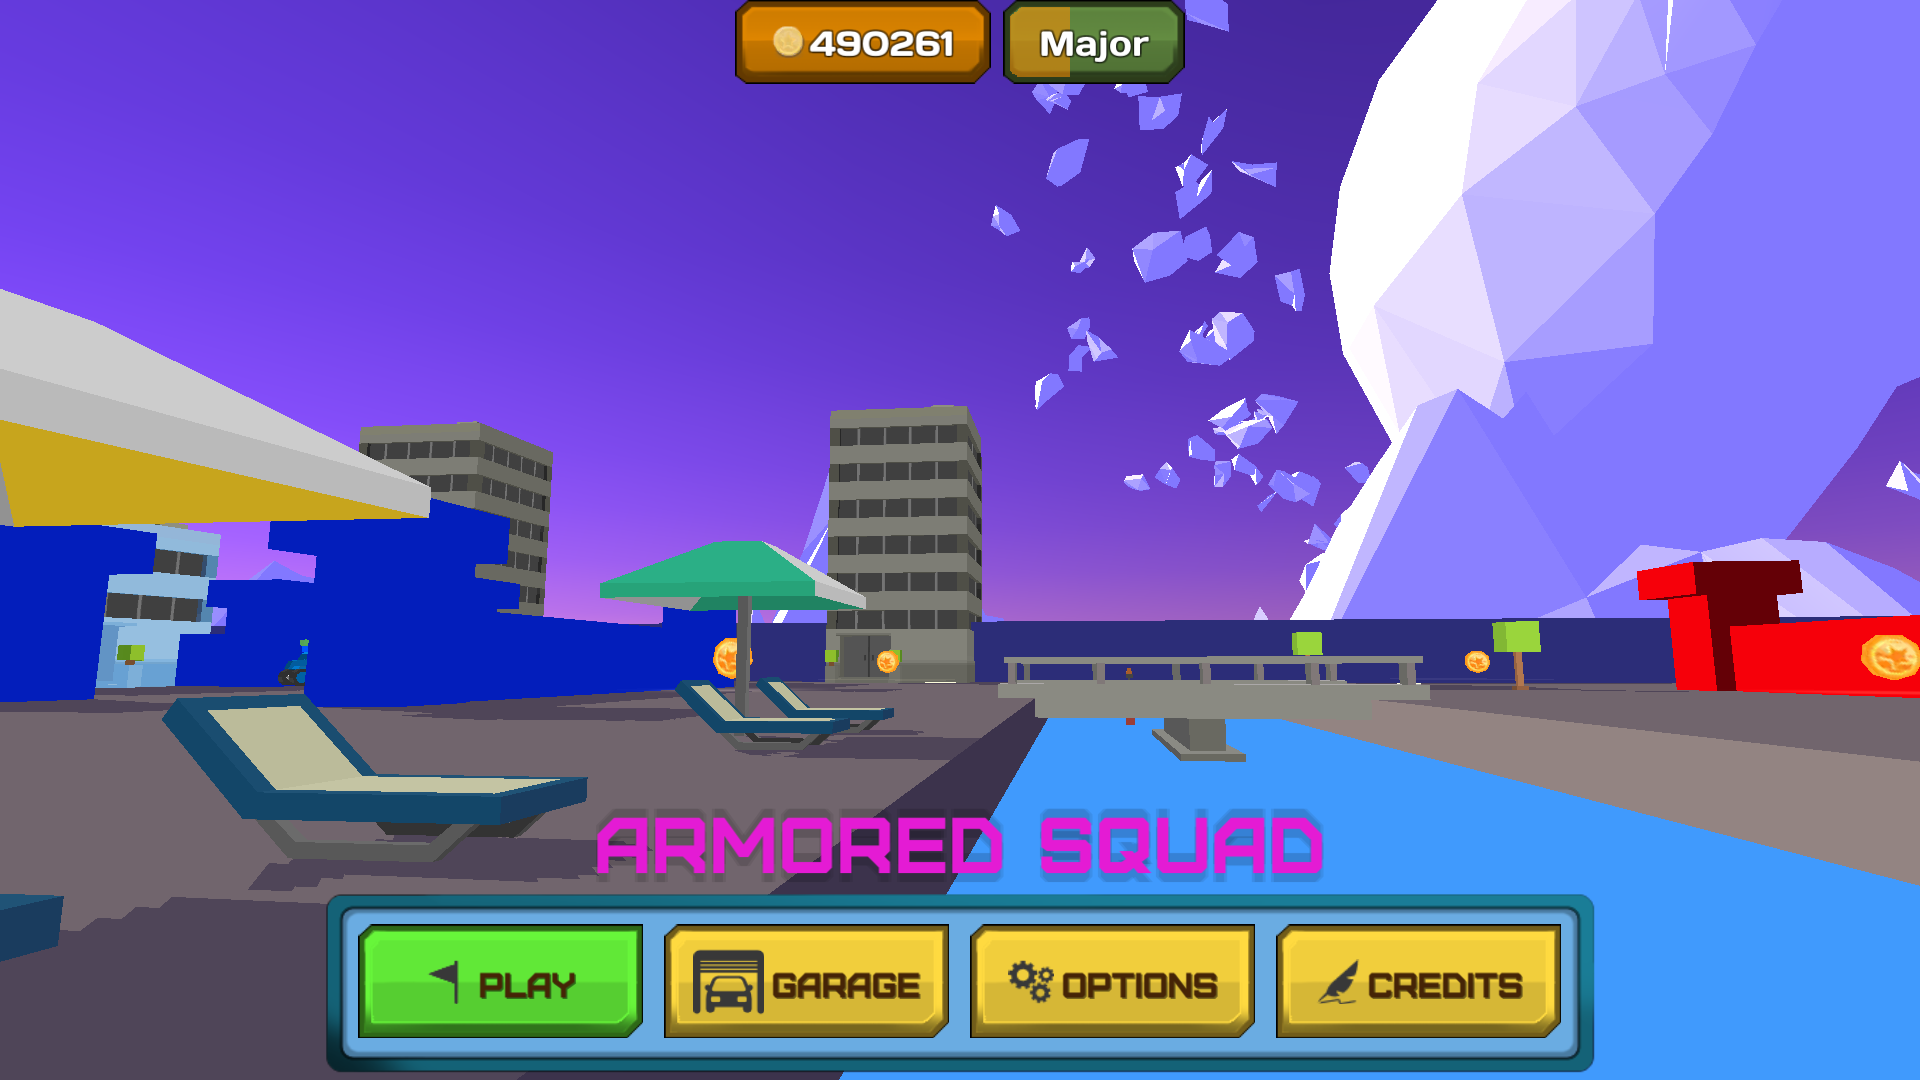 Screenshot from the main menu